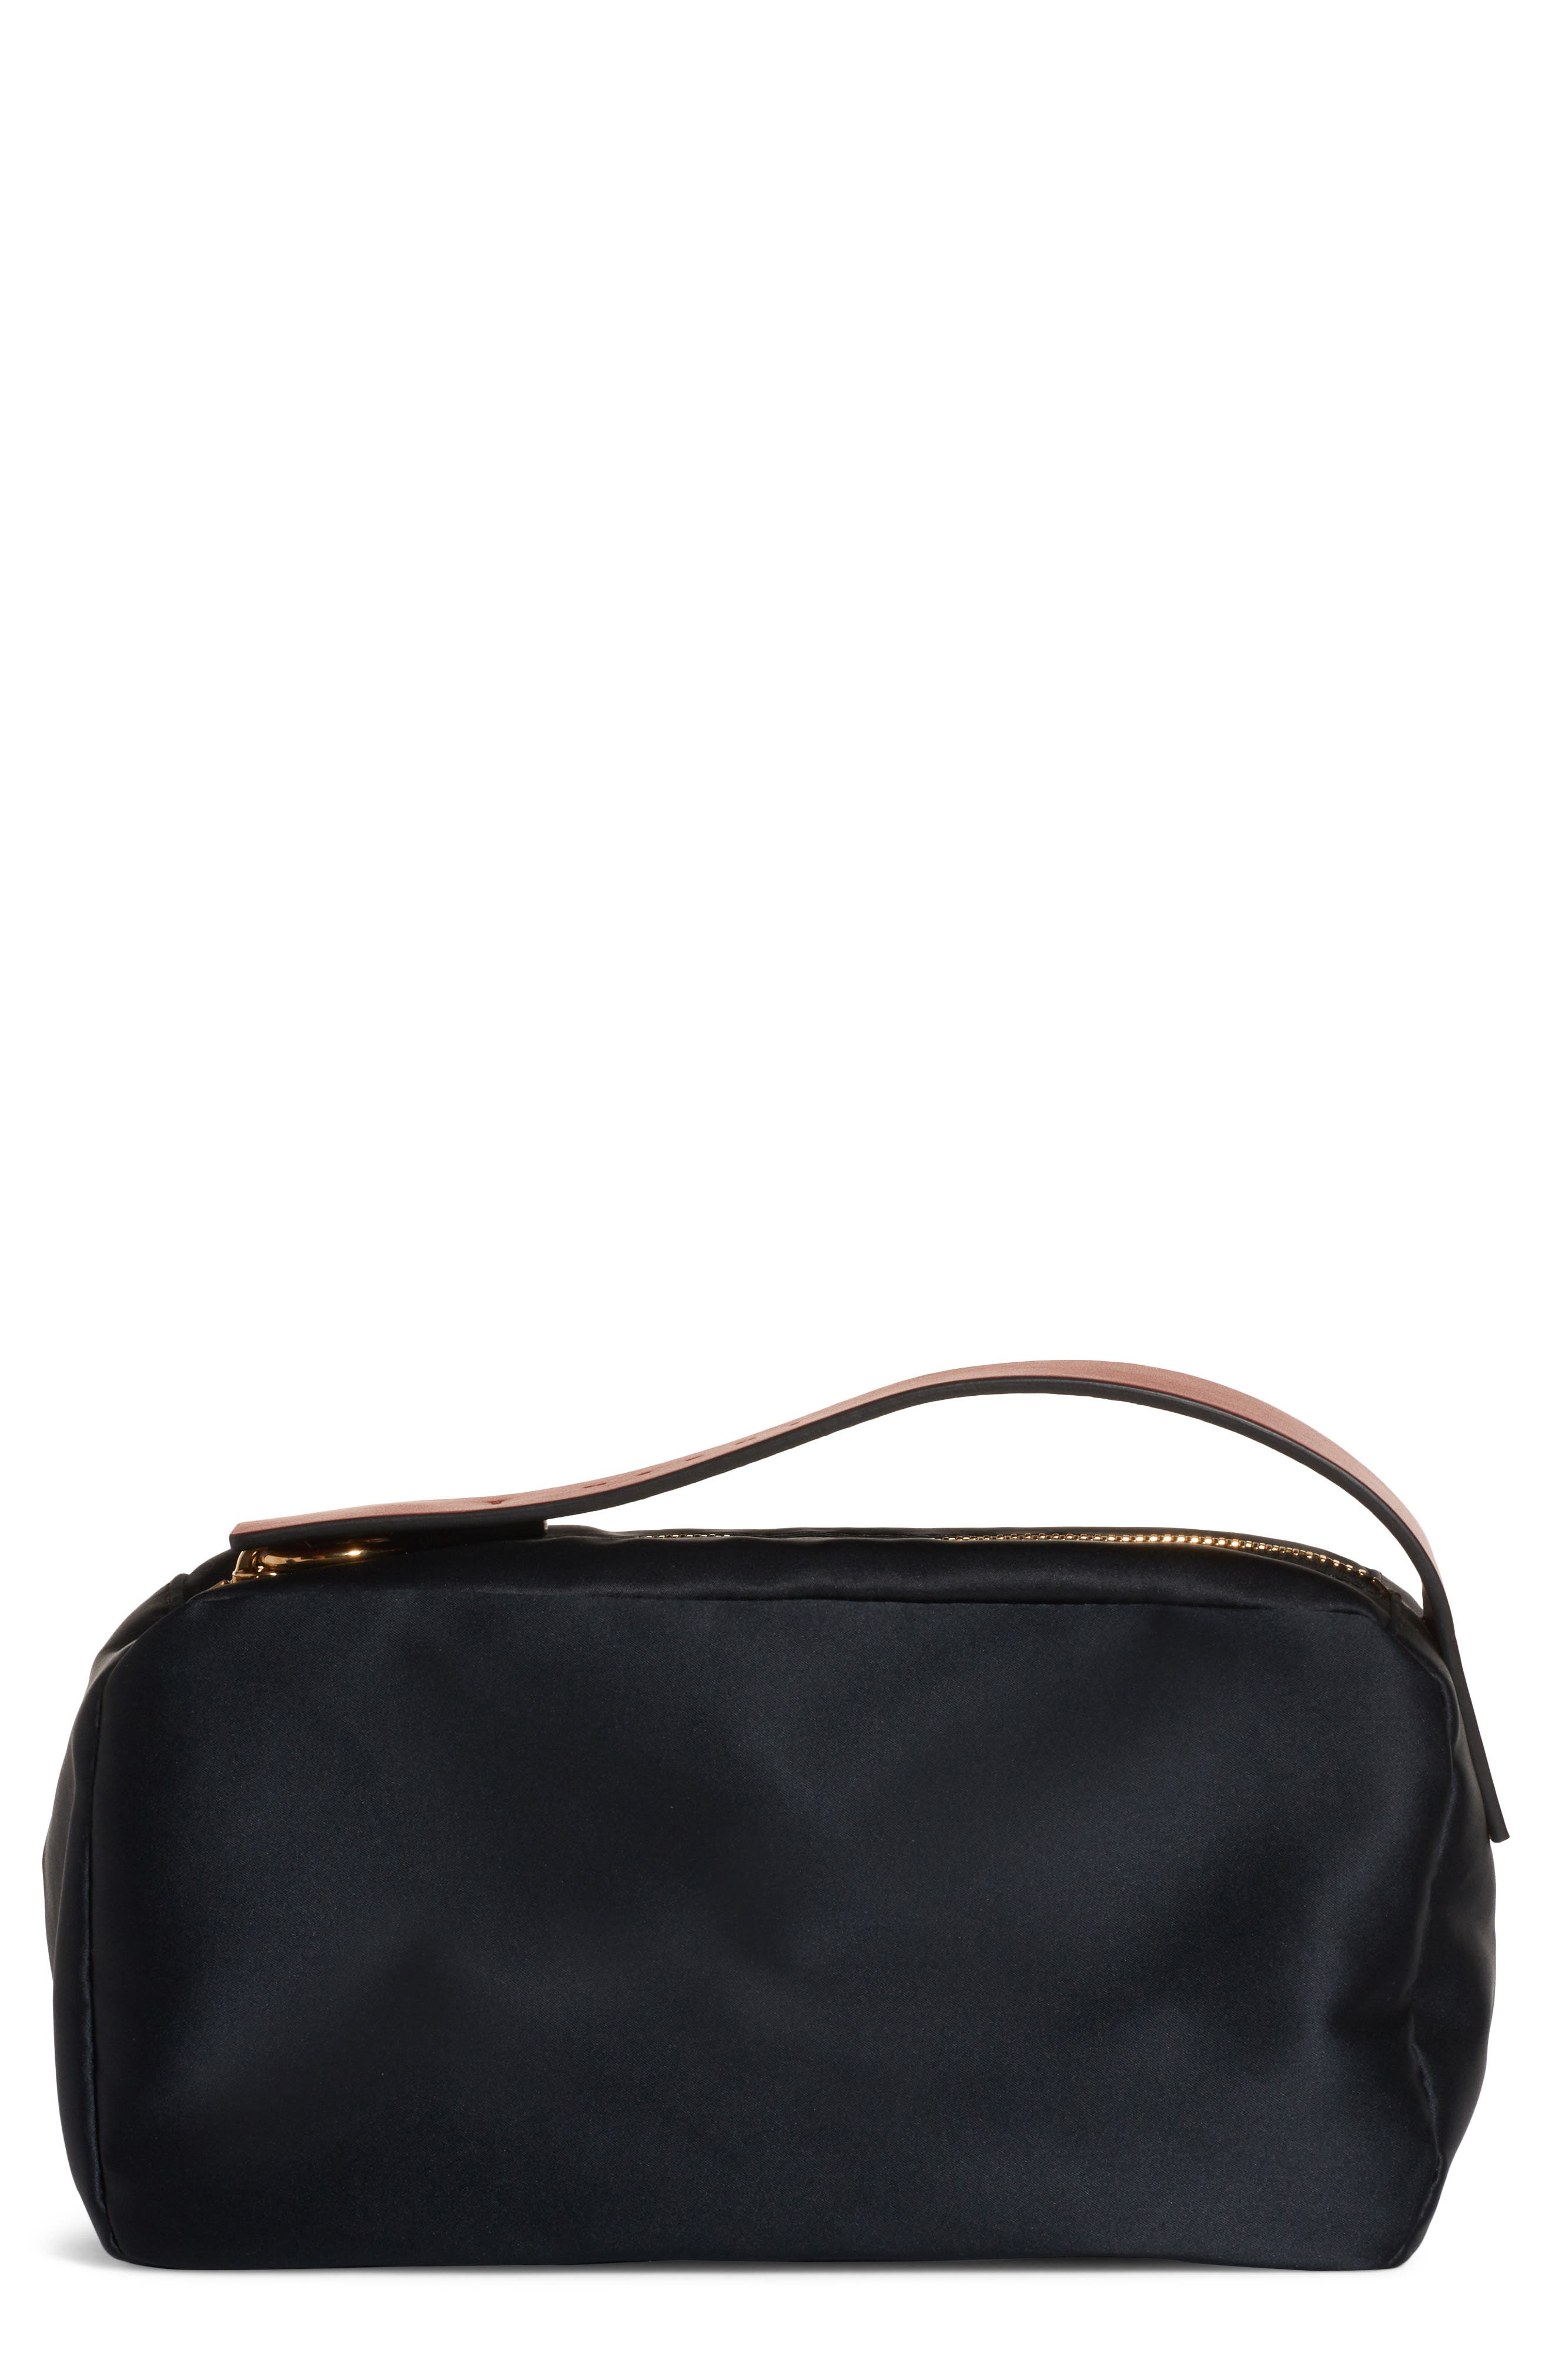 Law Bag Nylon Cosmetics Case in Black